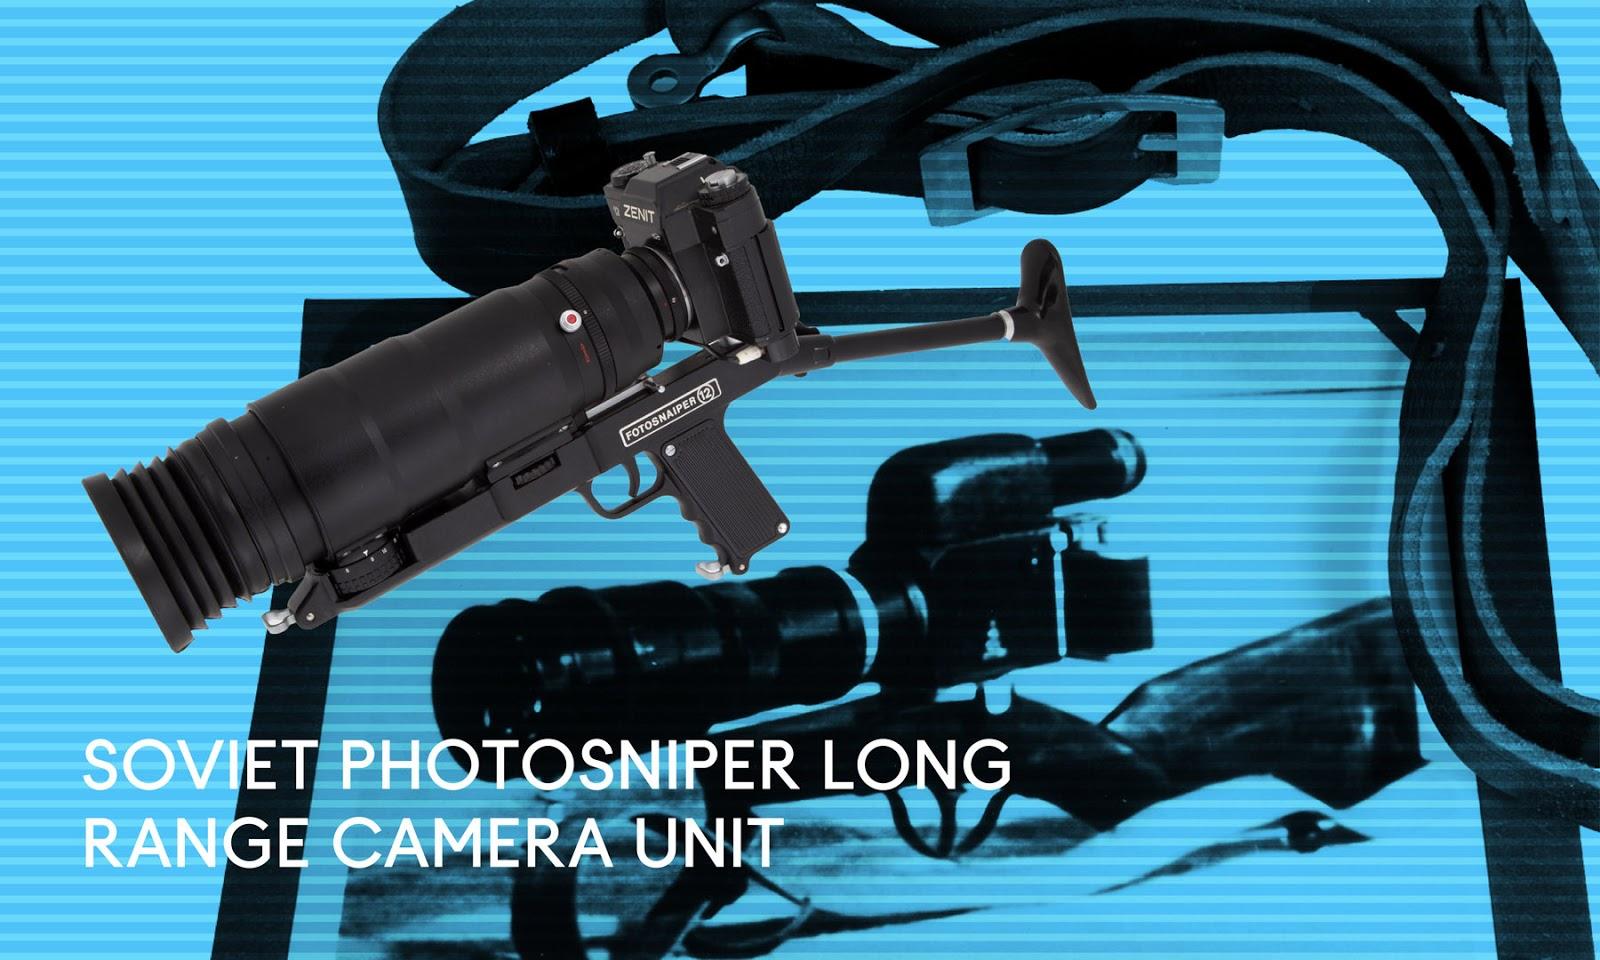 Zenit camera with photosniper shoulder harness